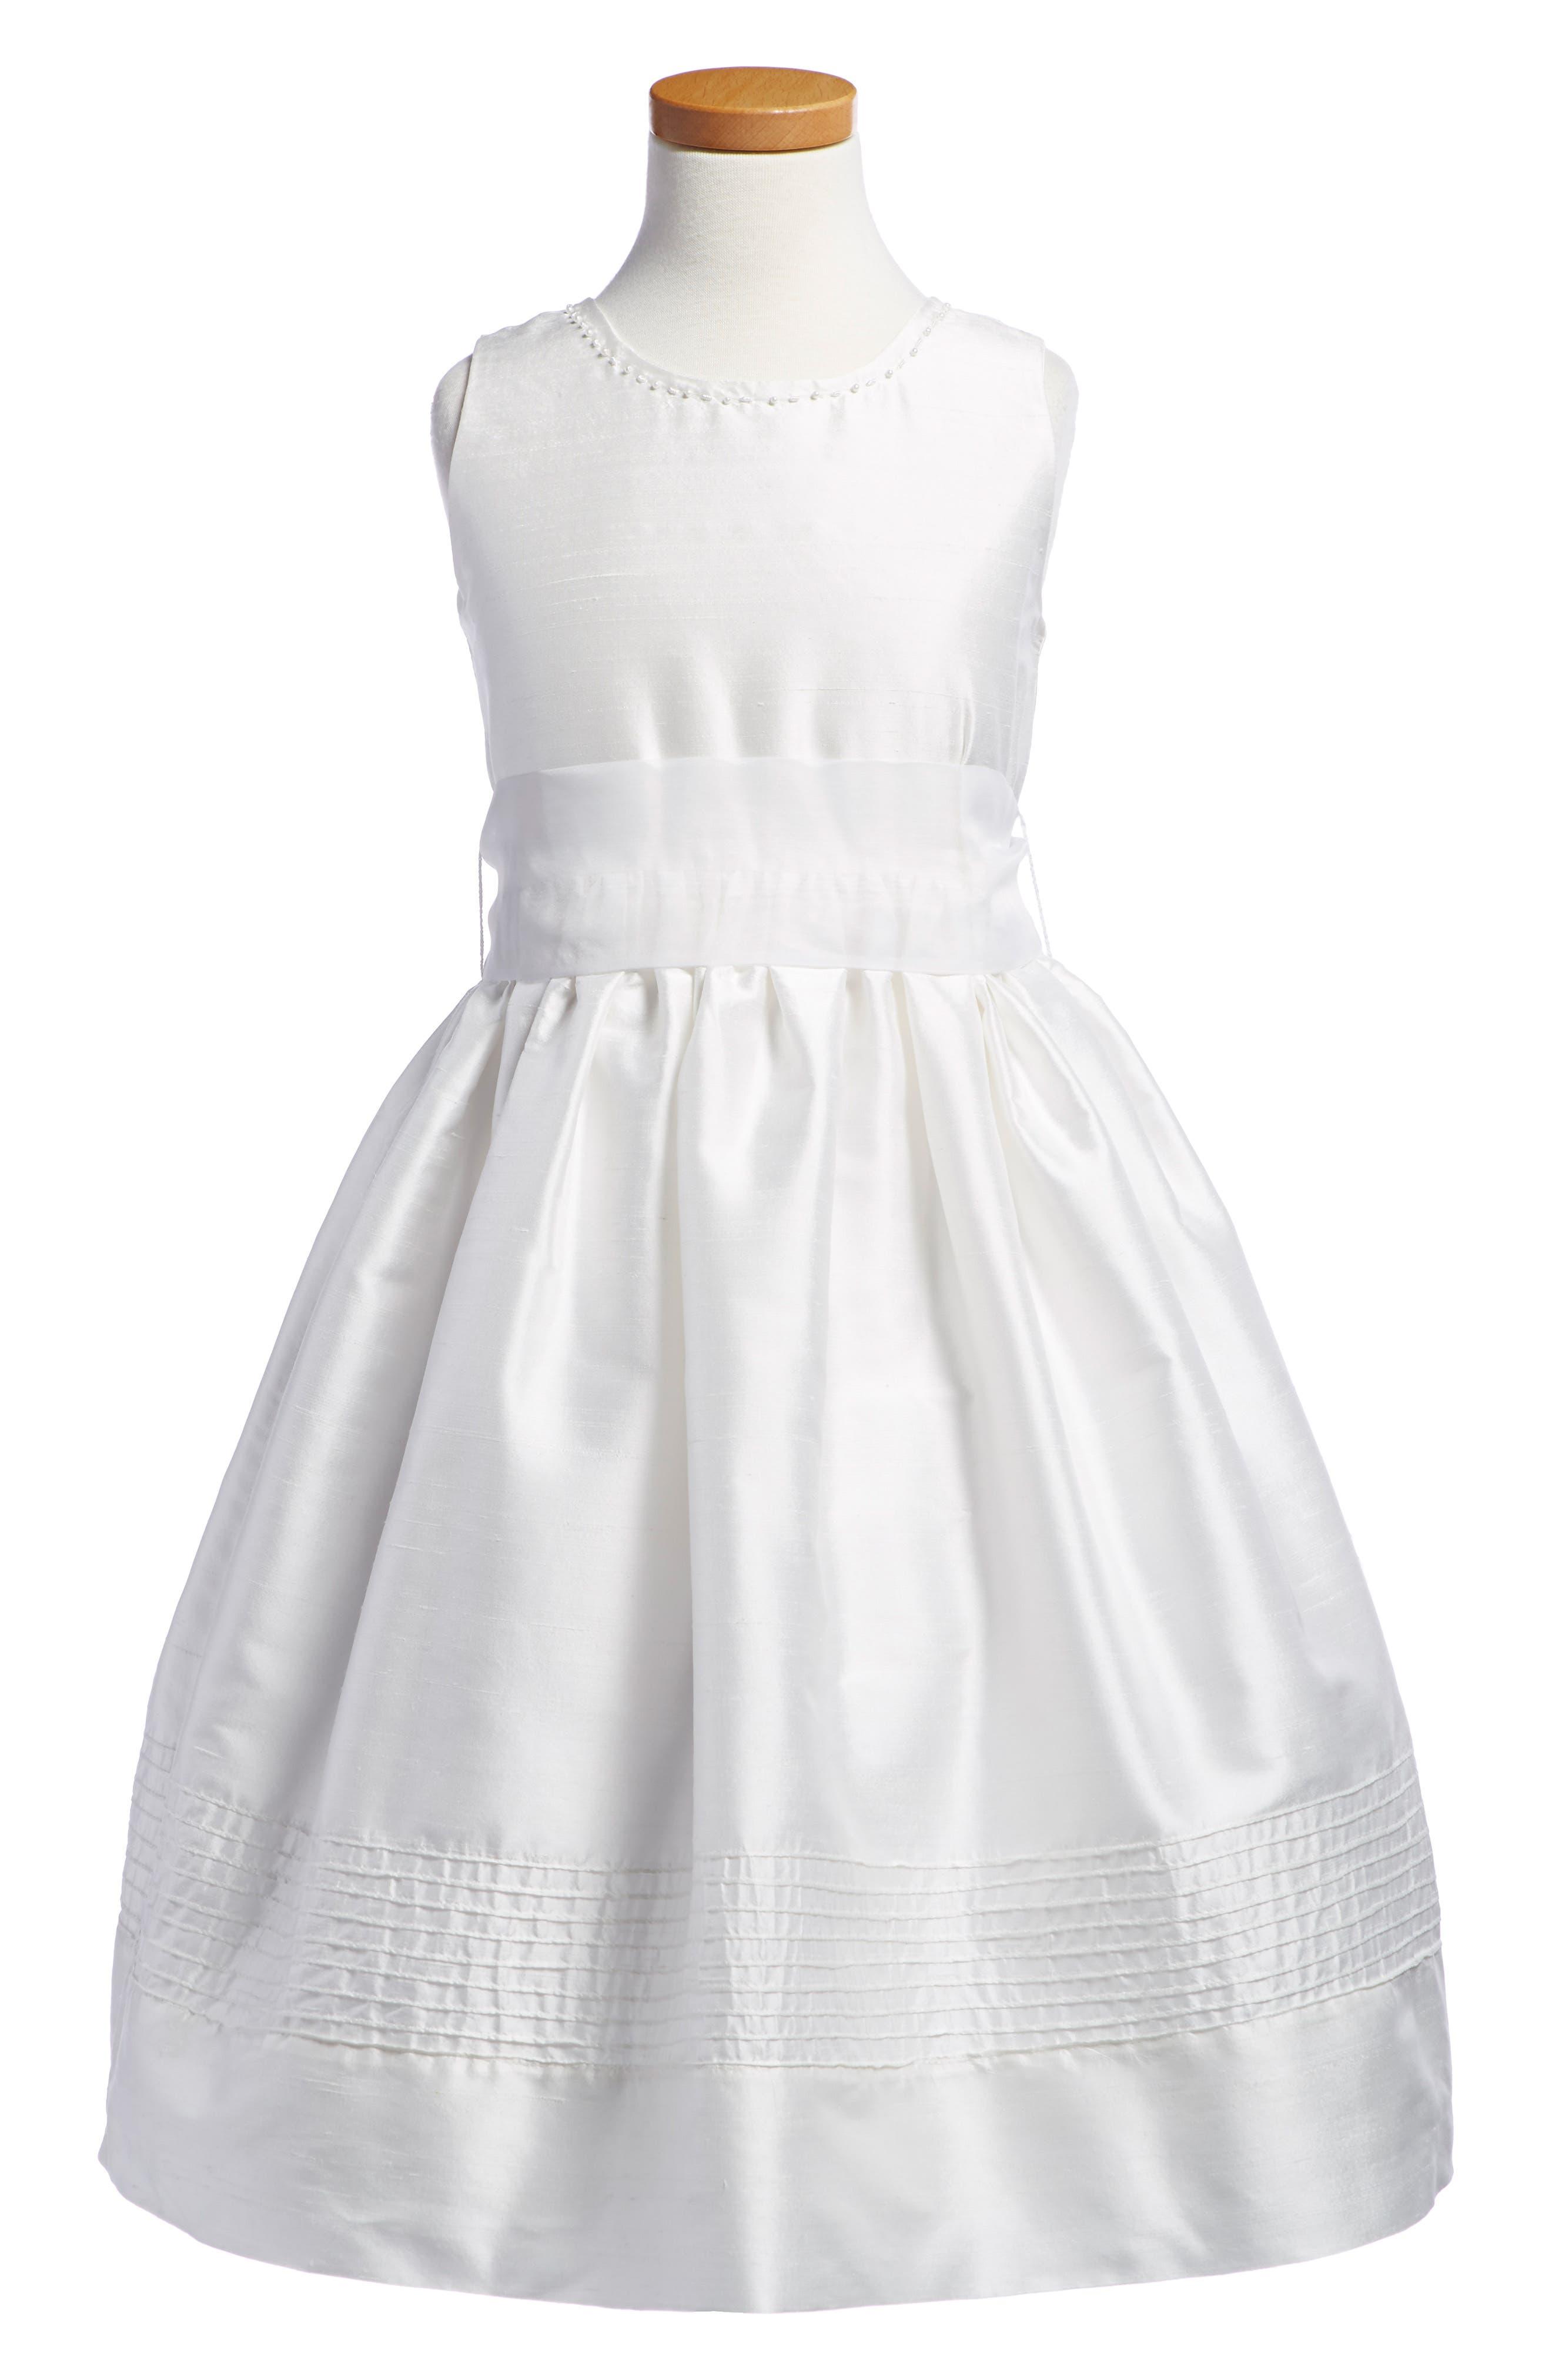 'Melody' Sleeveless Dress,                             Alternate thumbnail 2, color,                             105